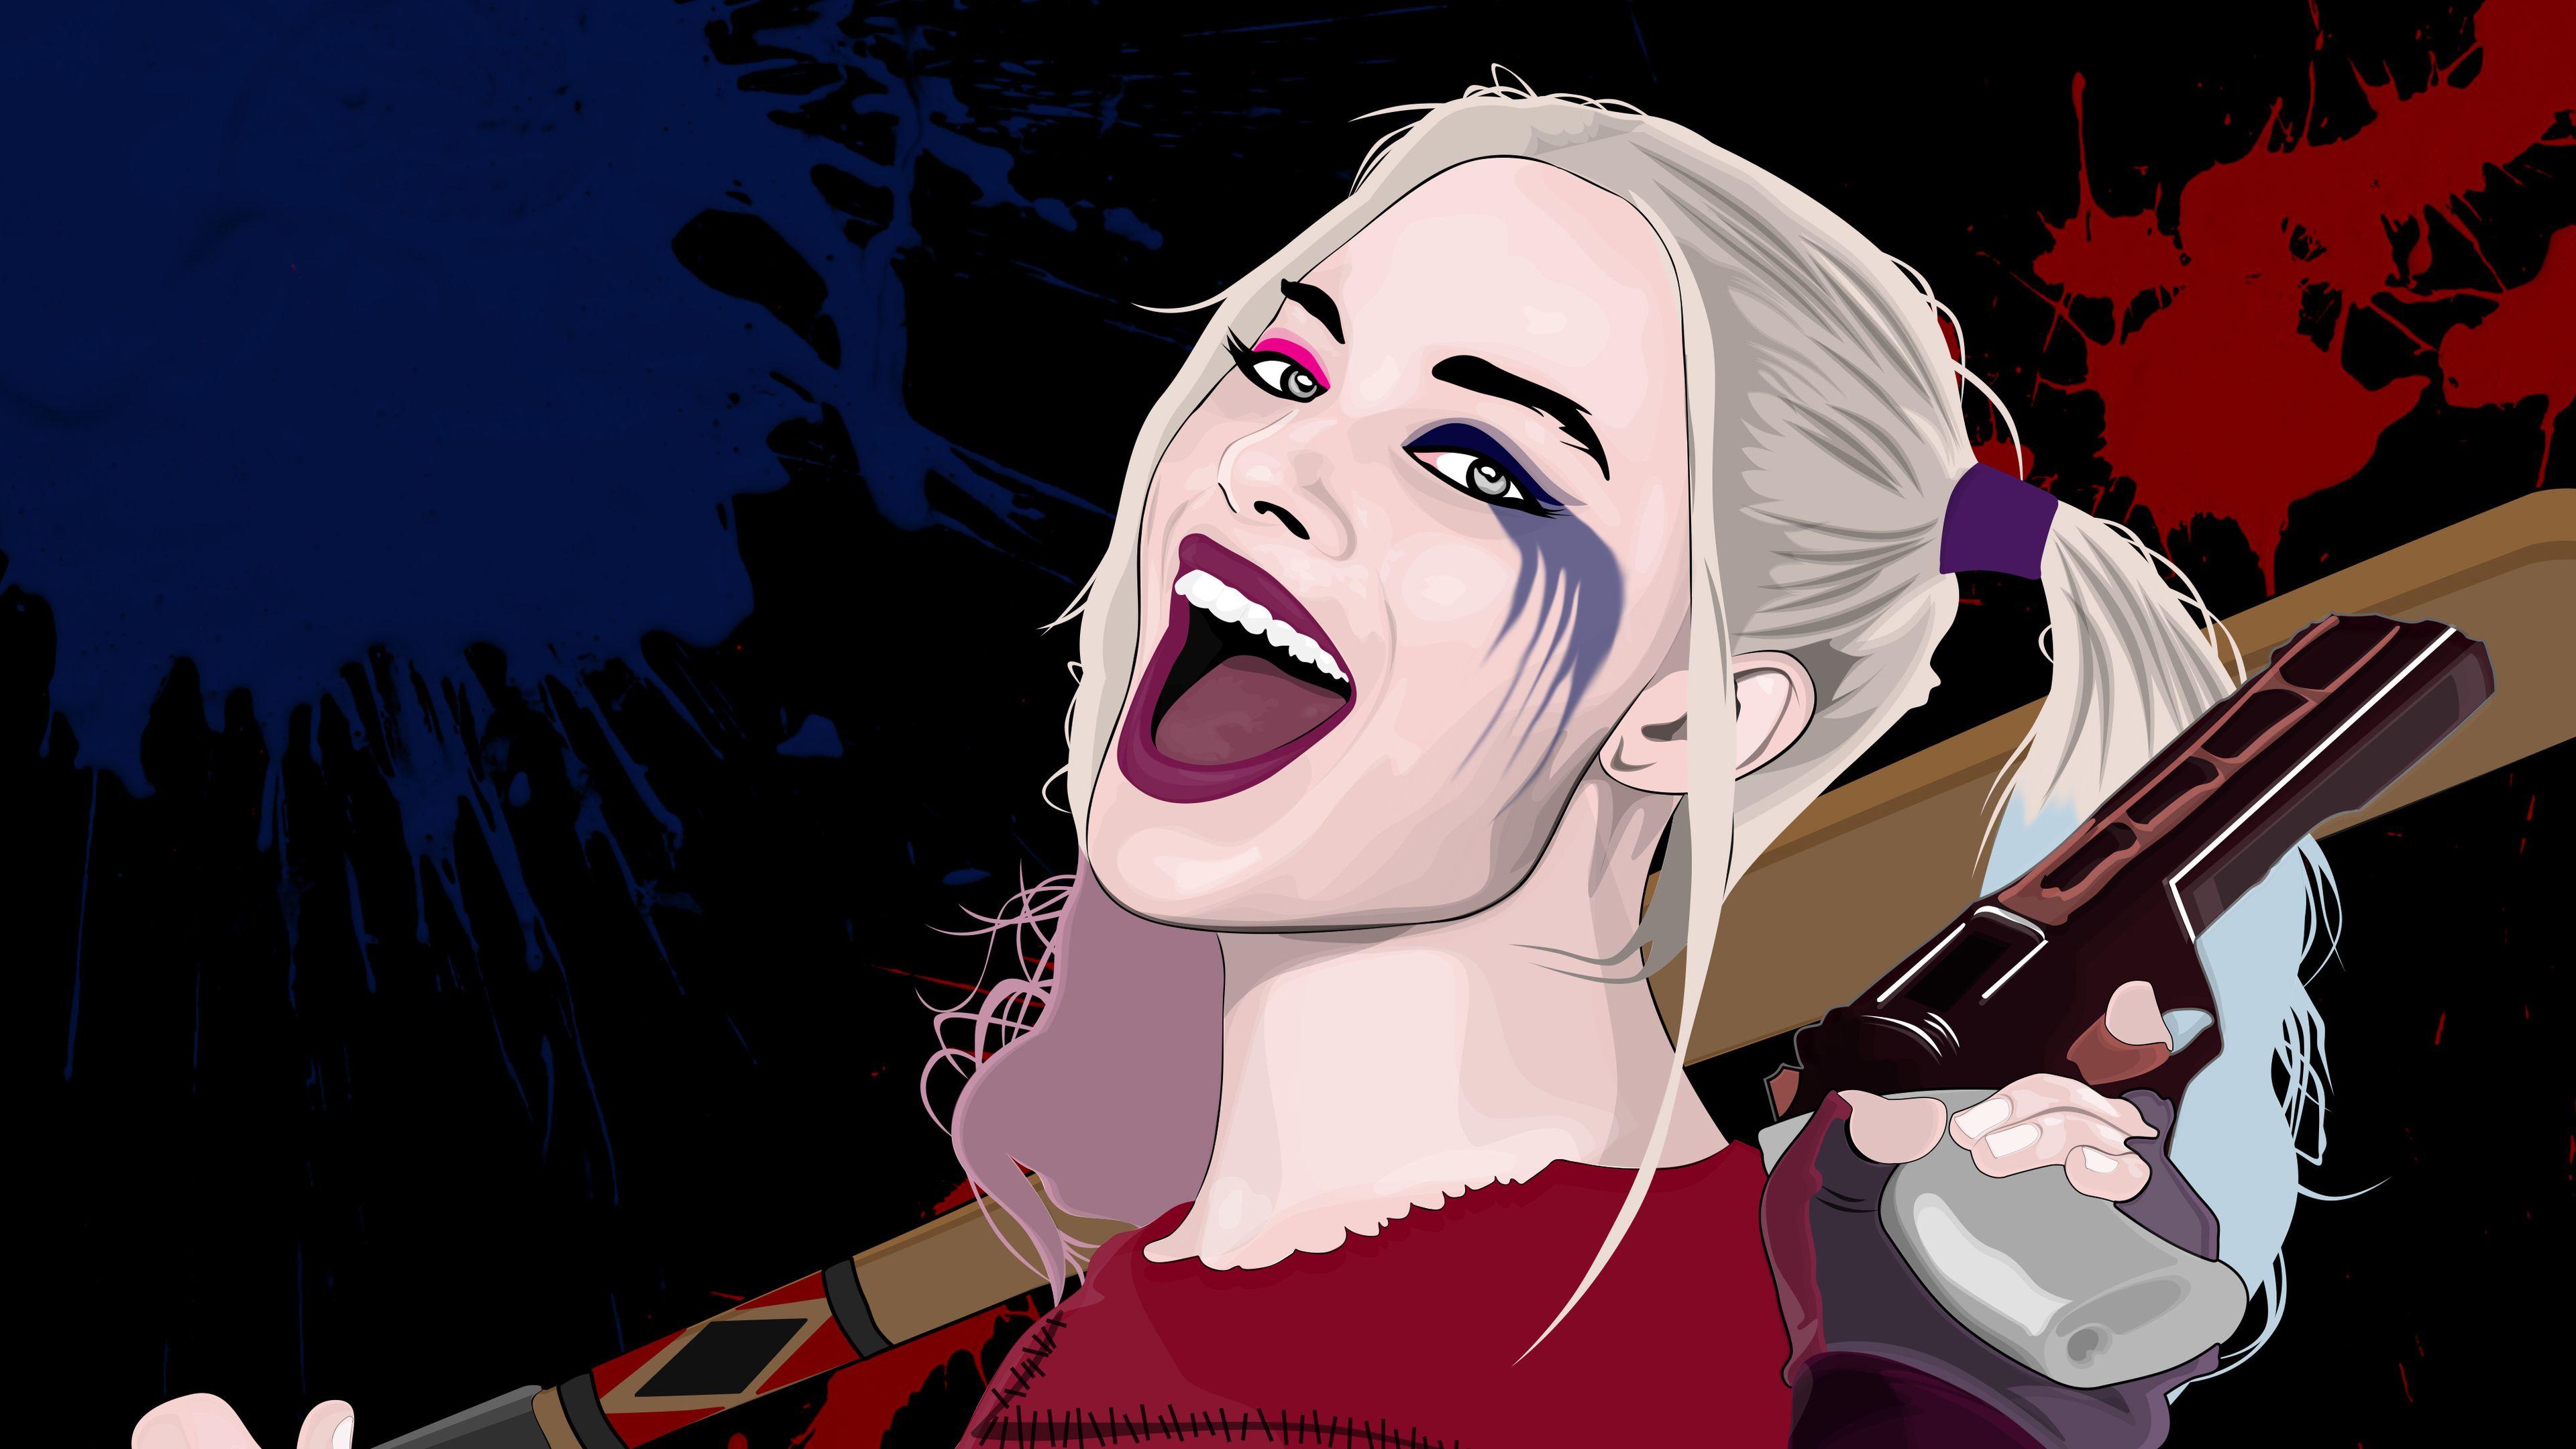 Harley Quinn Vector Portrait Superheroes Wallpapers Hd Wallpapers